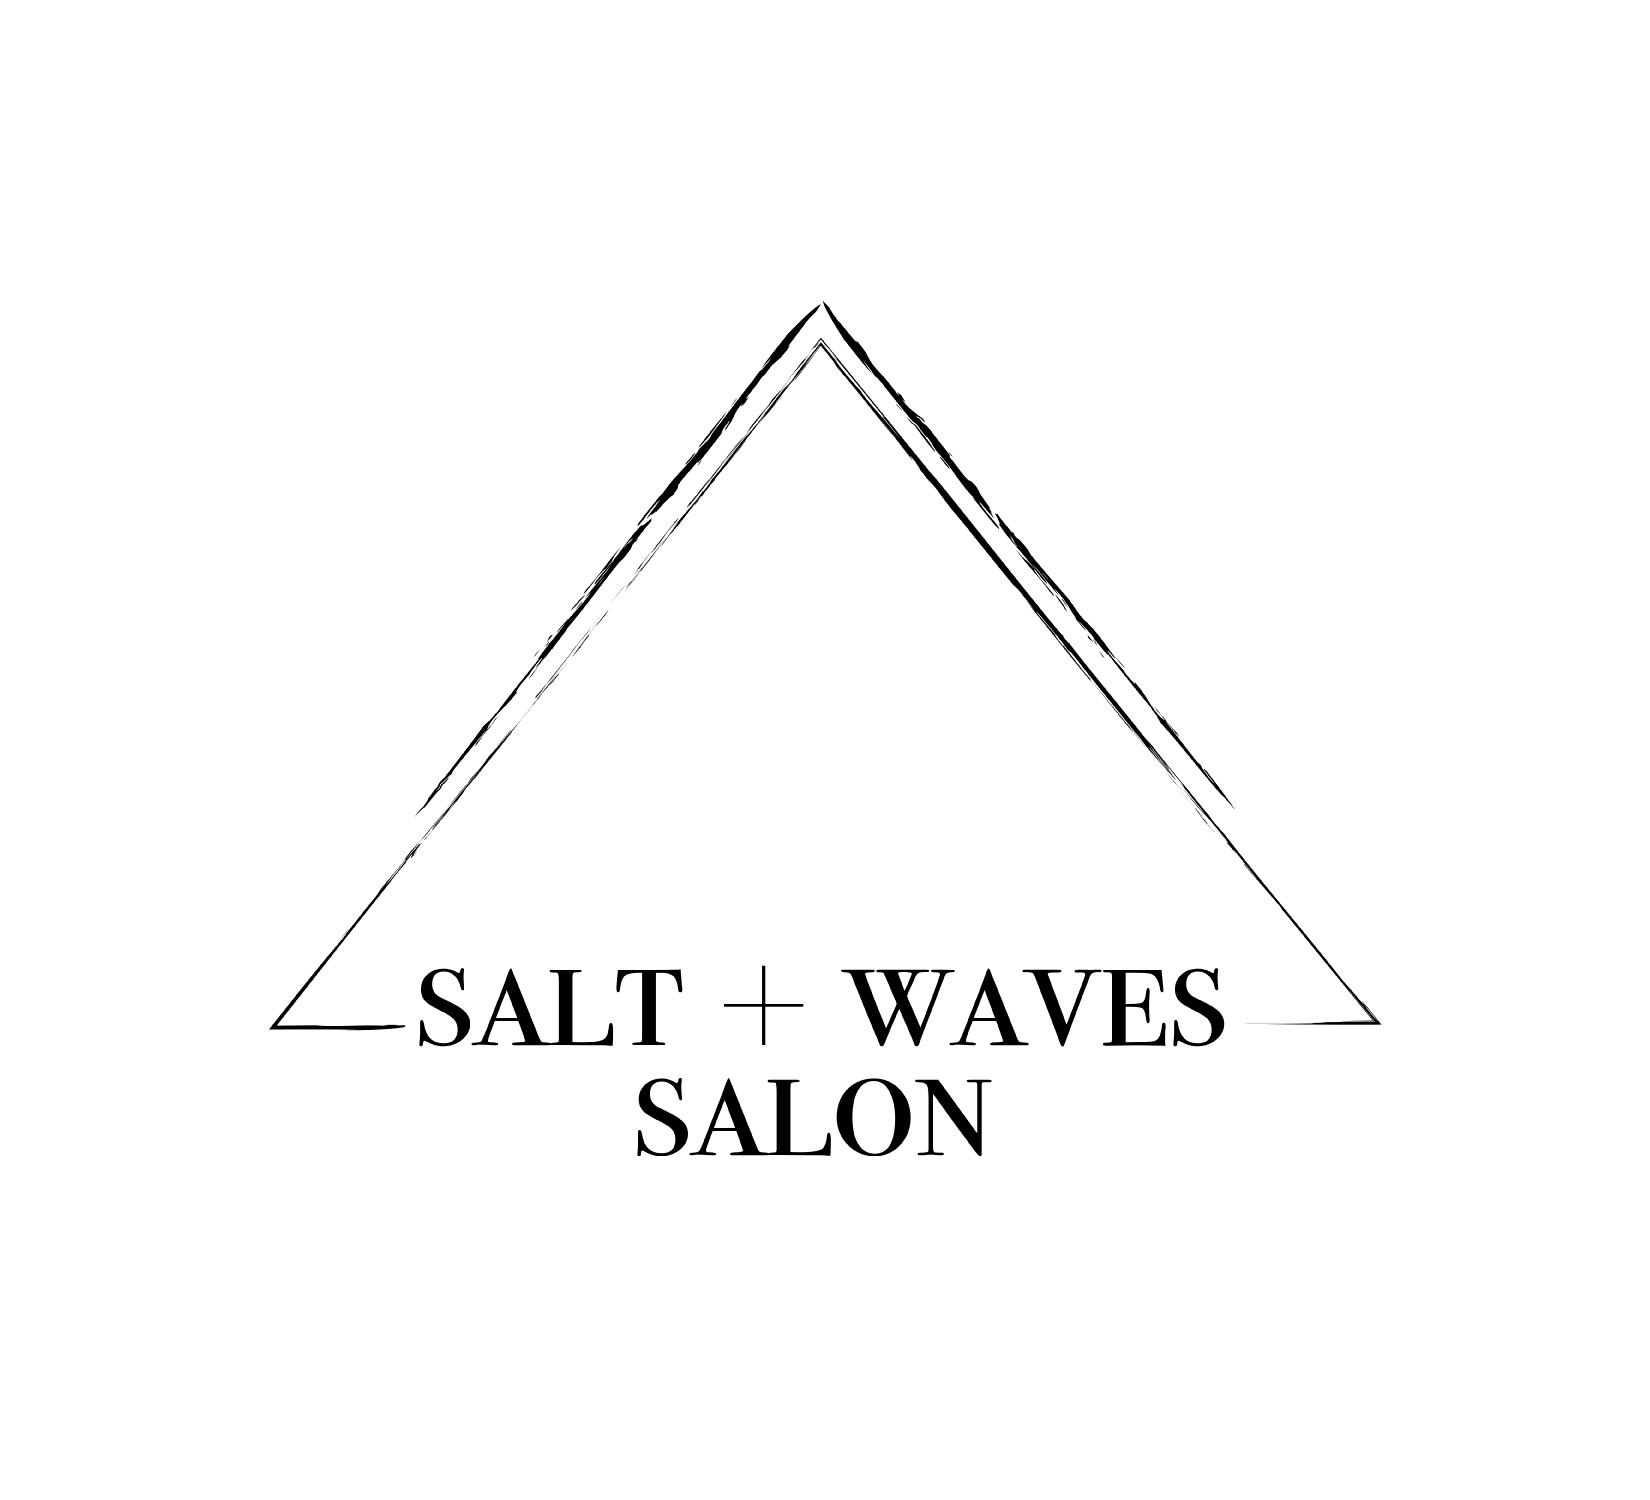 salt + waves logo